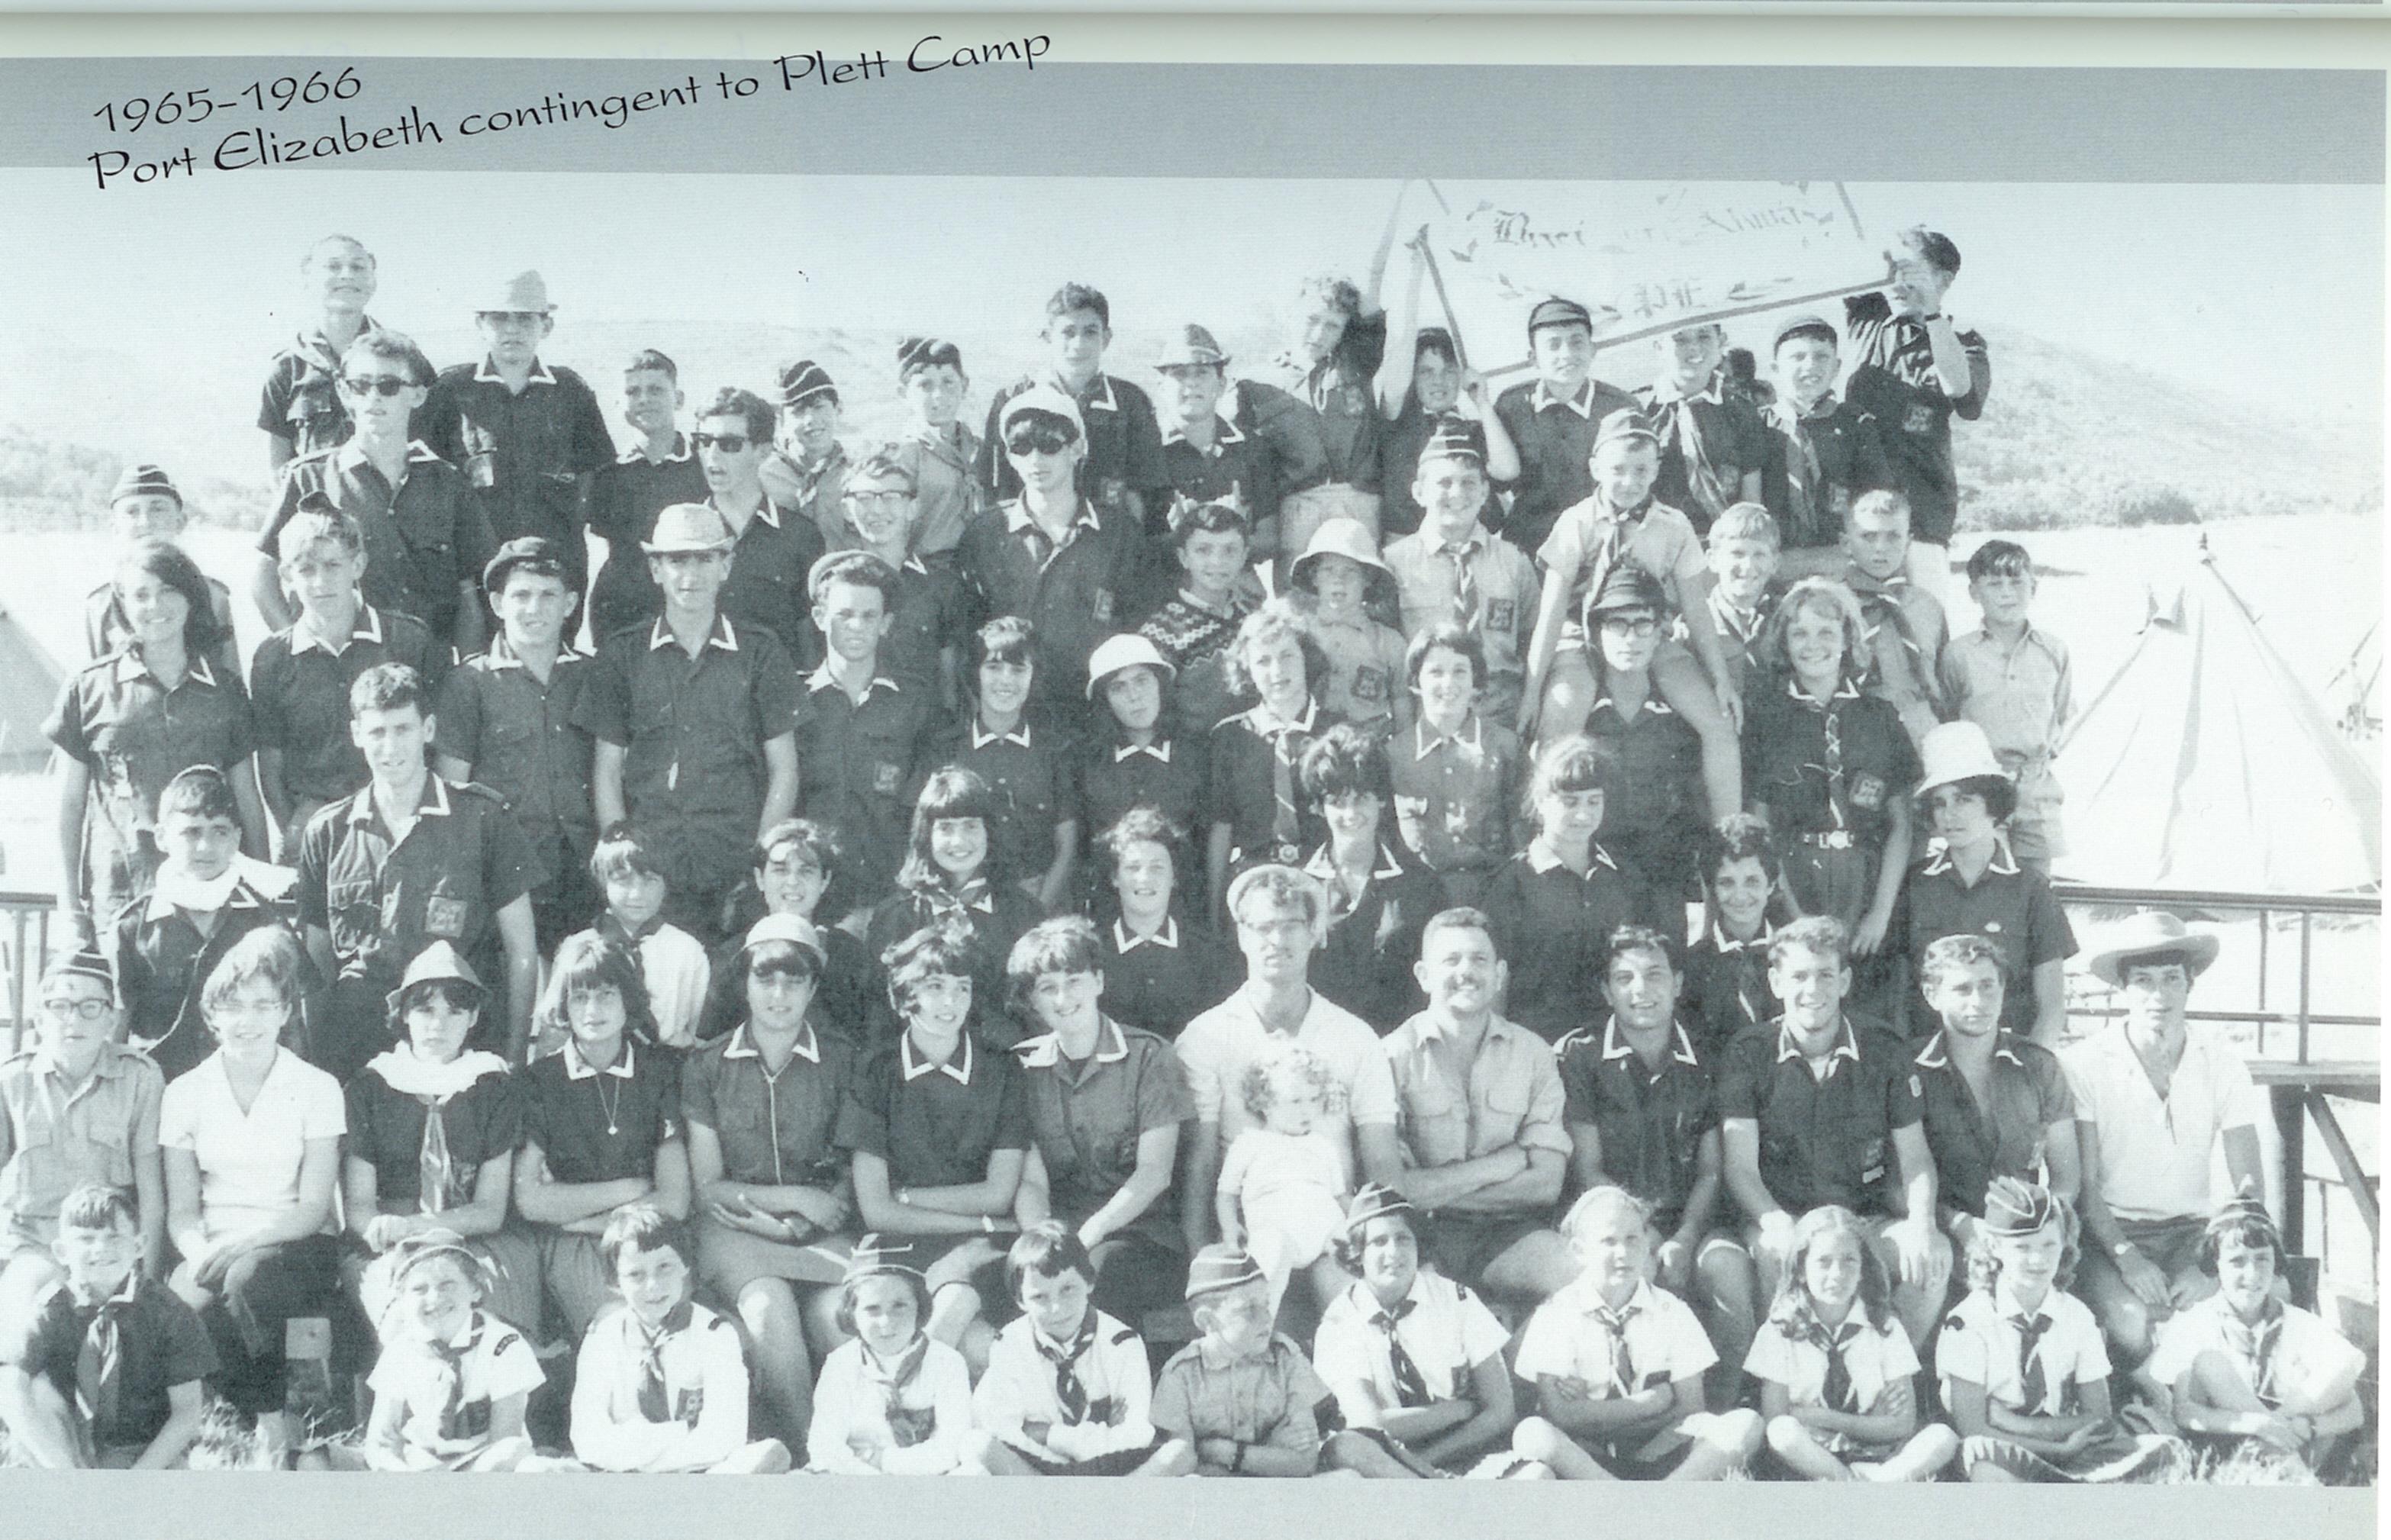 PE Chevrah at Plett Bay 1965